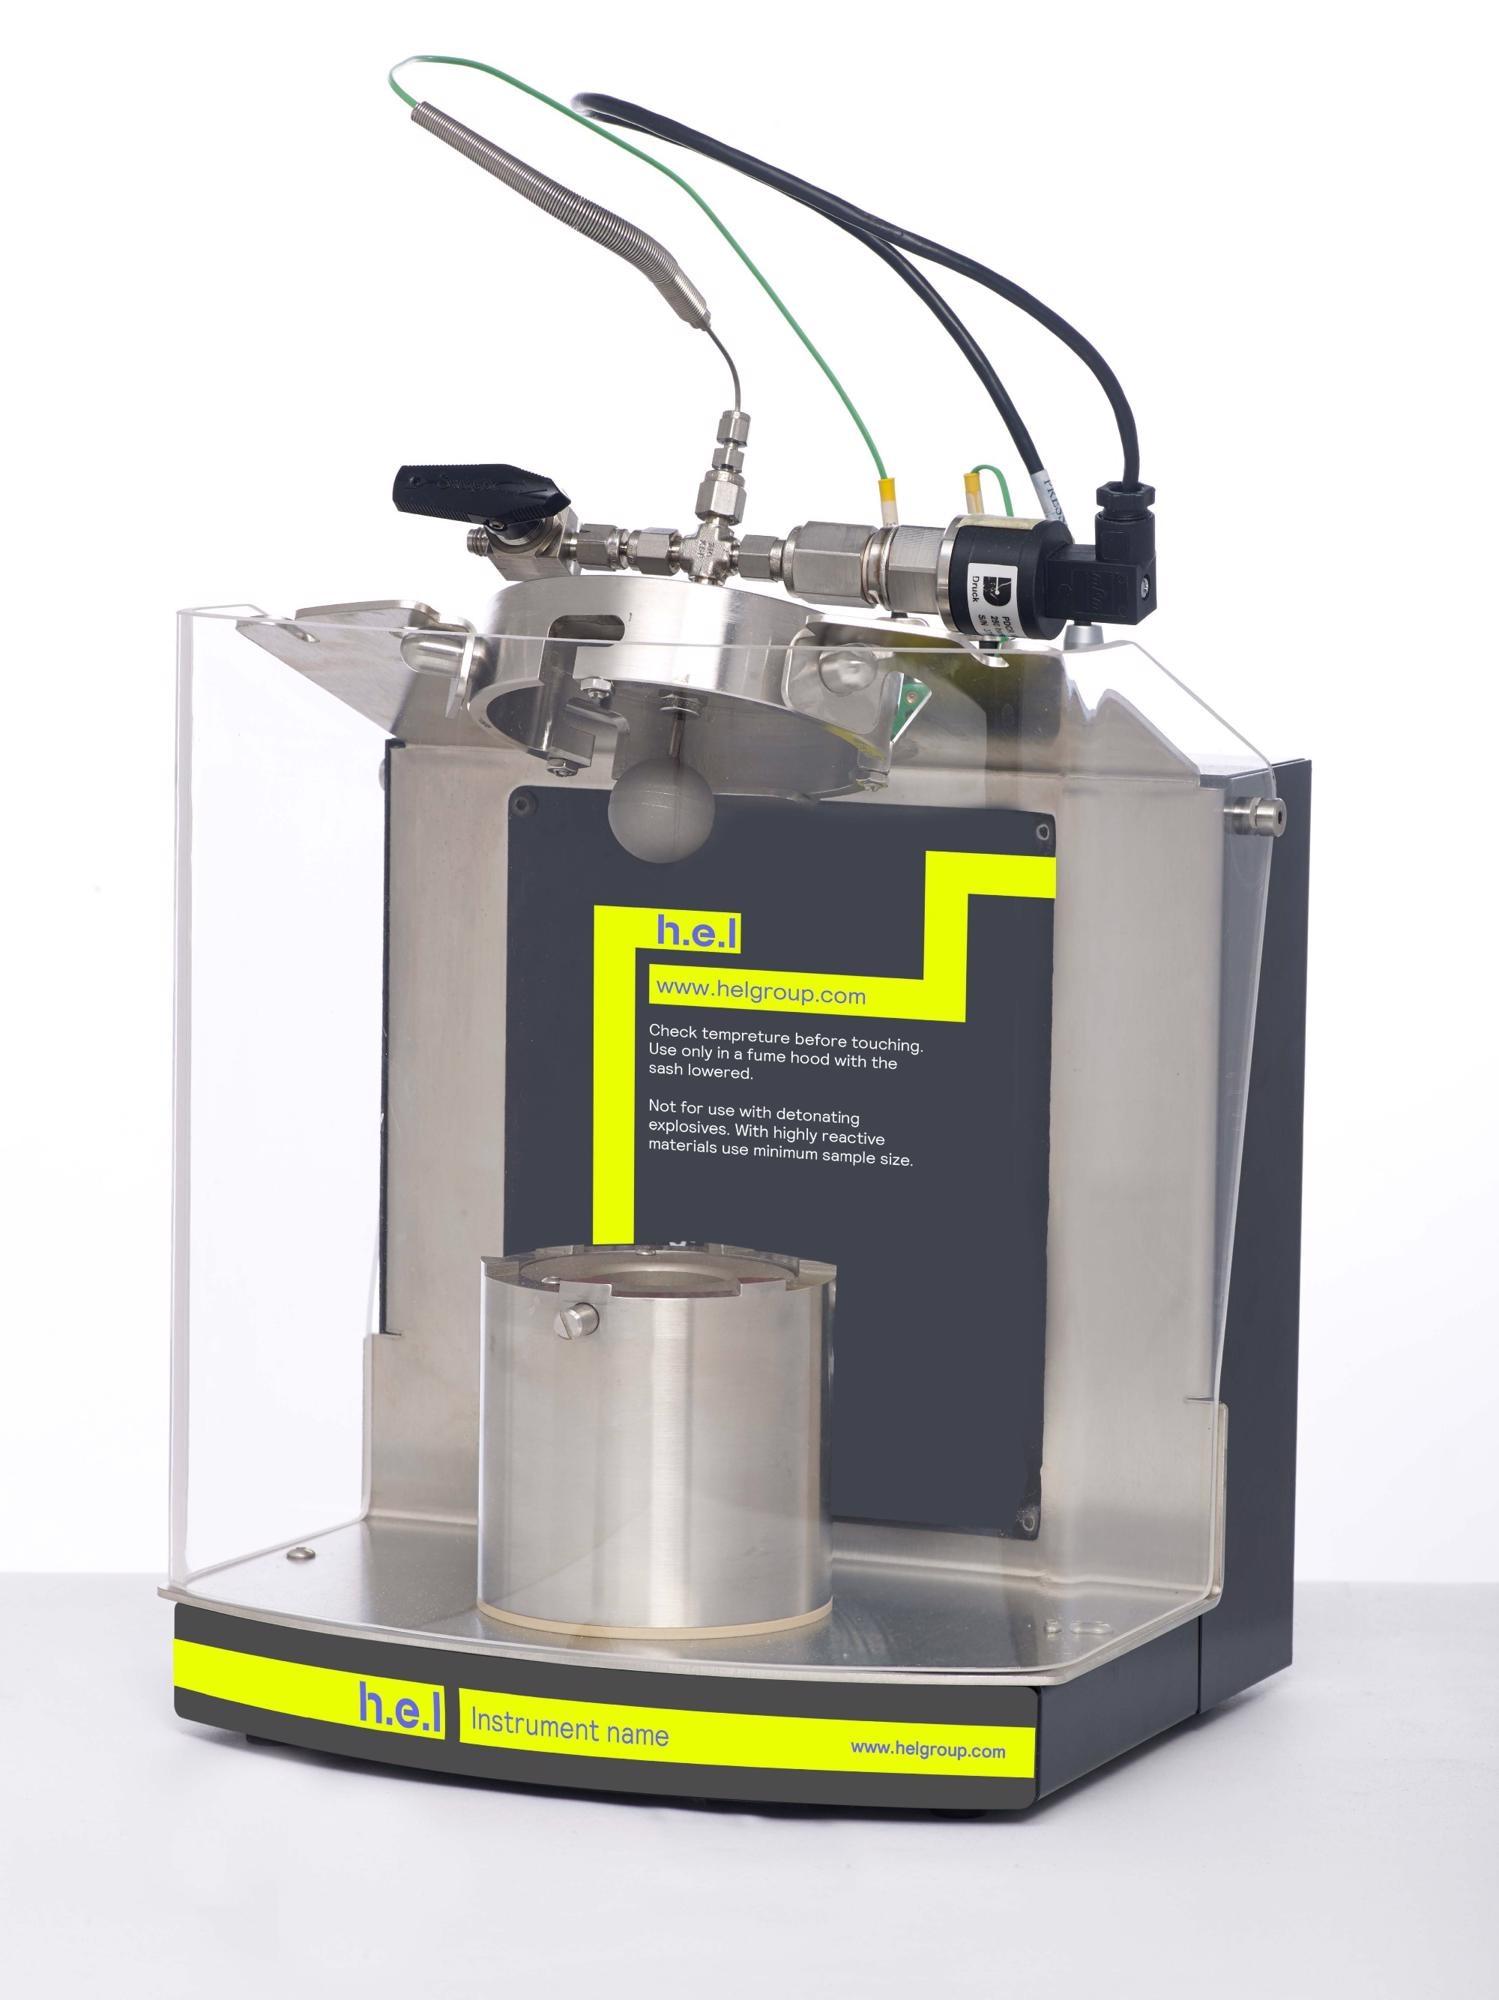 TSu: A Bench-Top, Thermal and Pressure Hazard Screening Platform